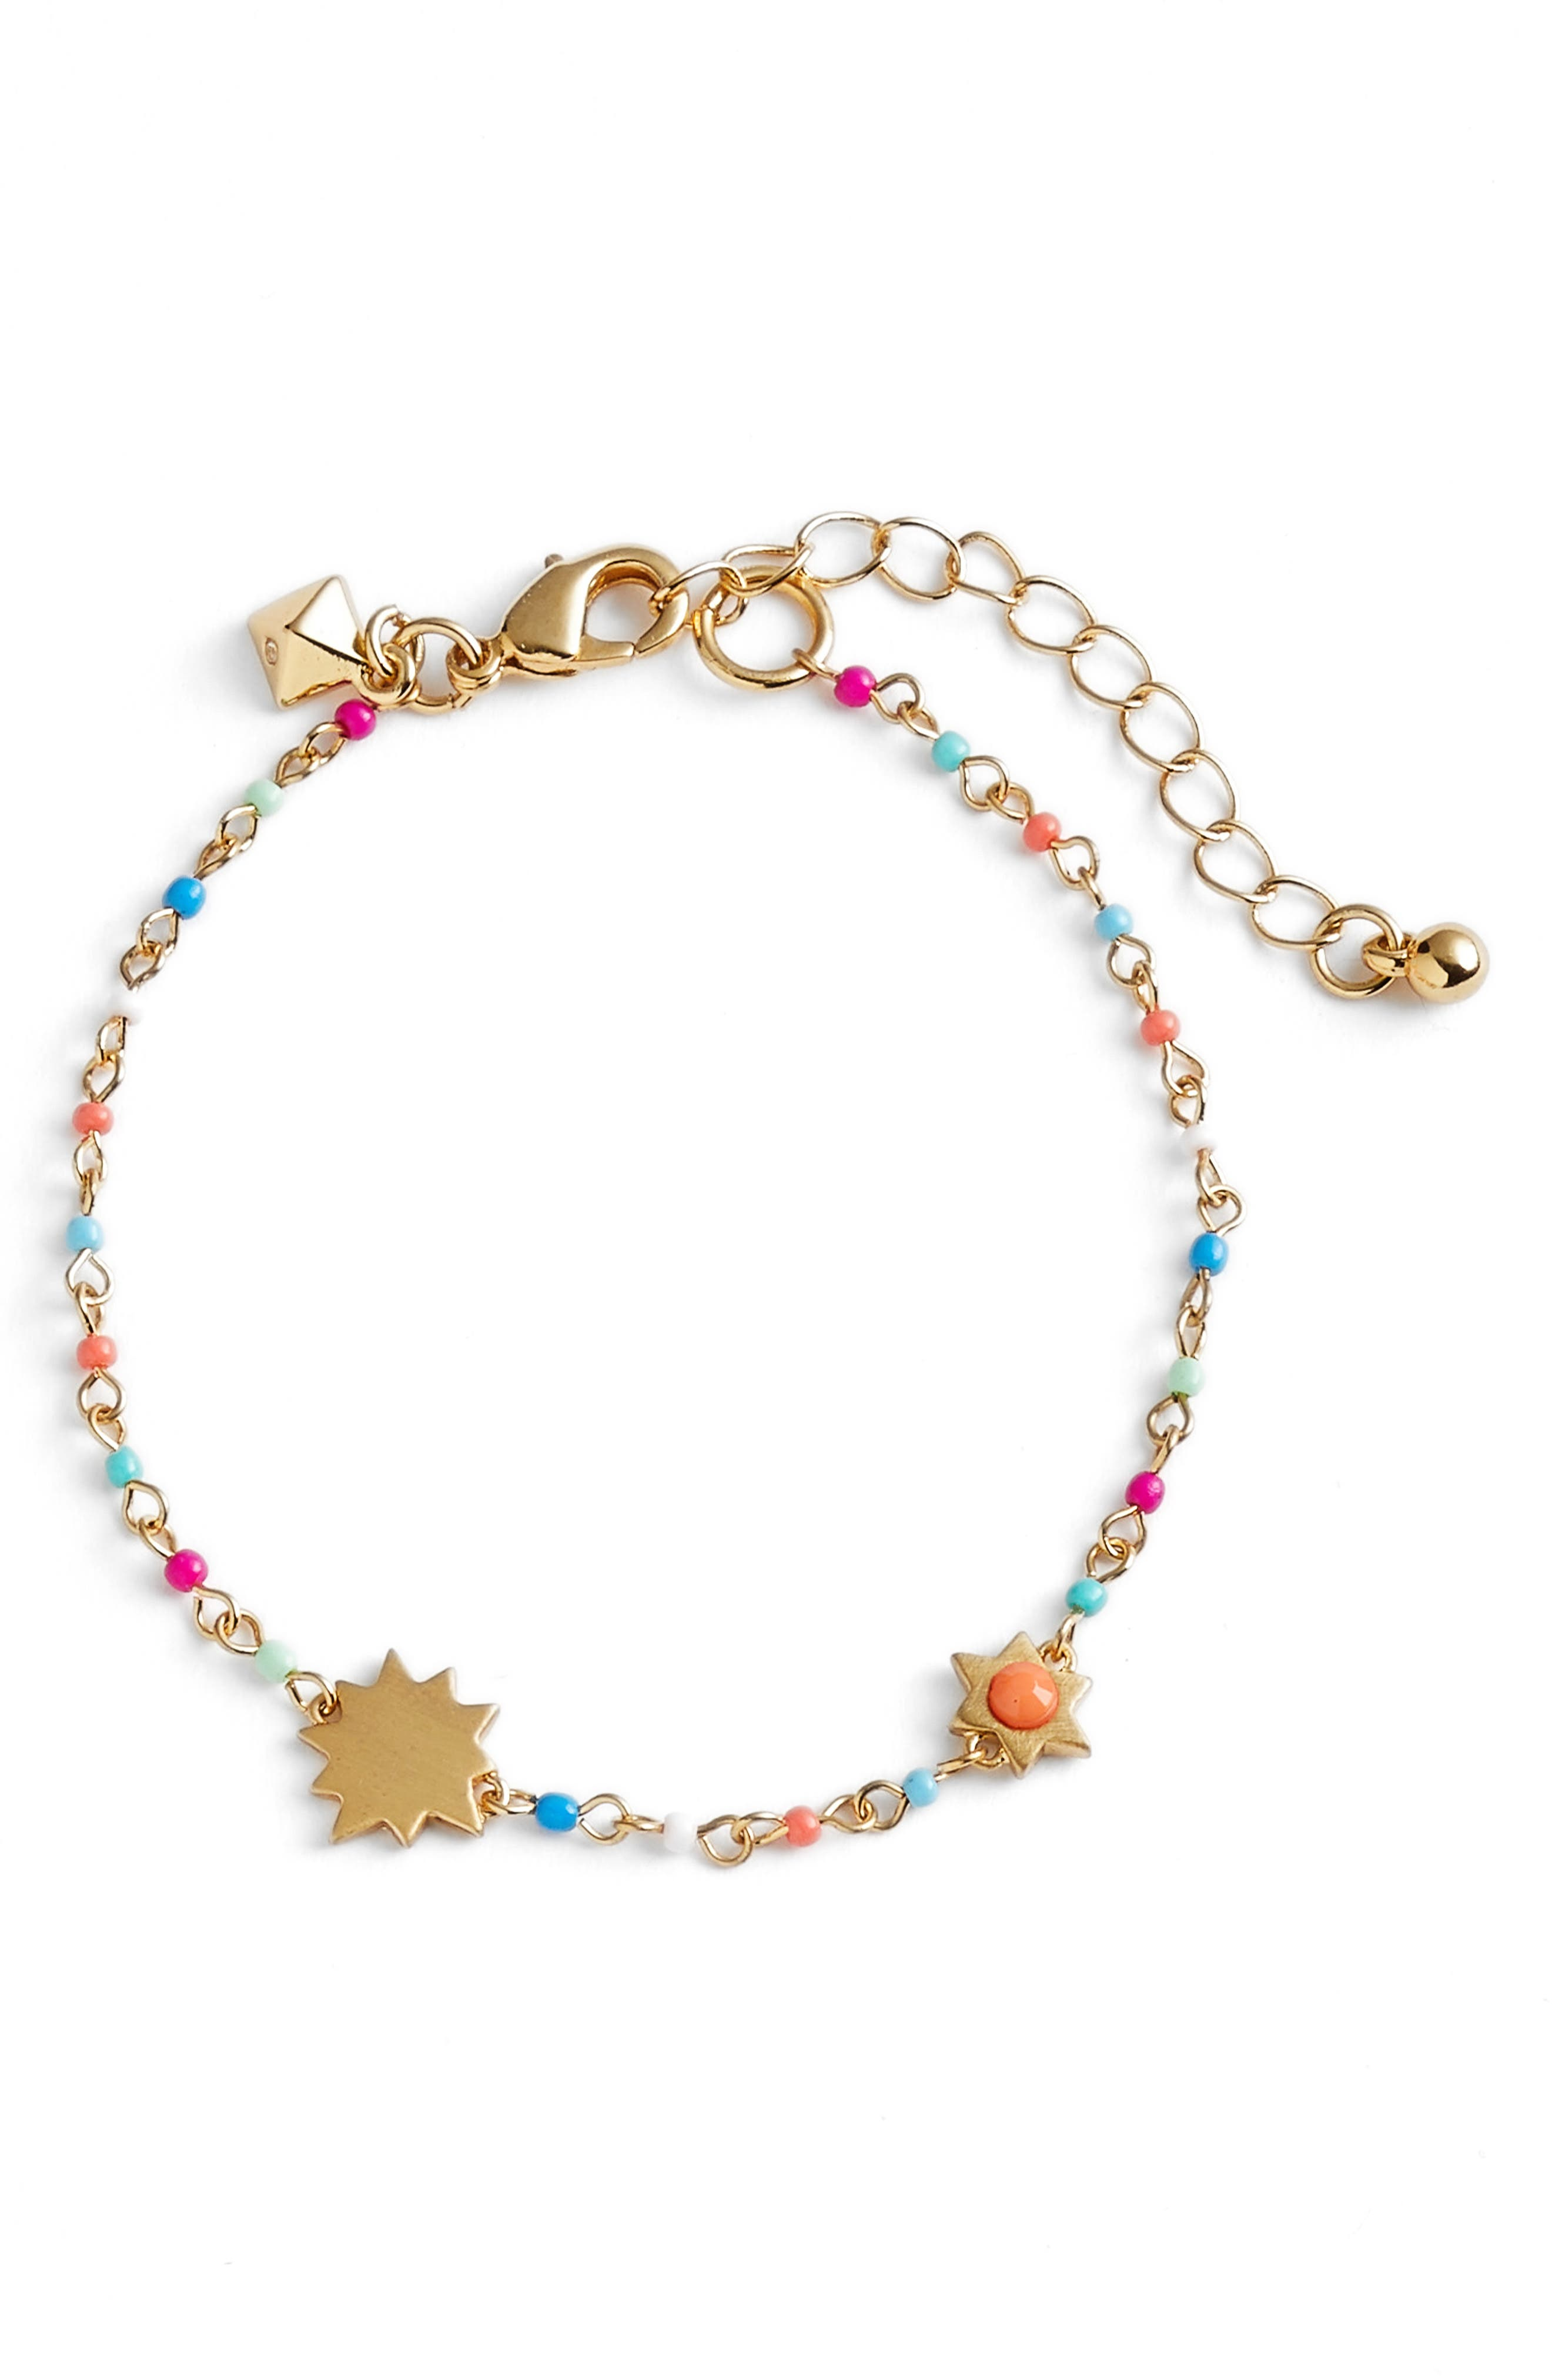 Sole Beaded Link Bracelet,                             Main thumbnail 1, color,                             710